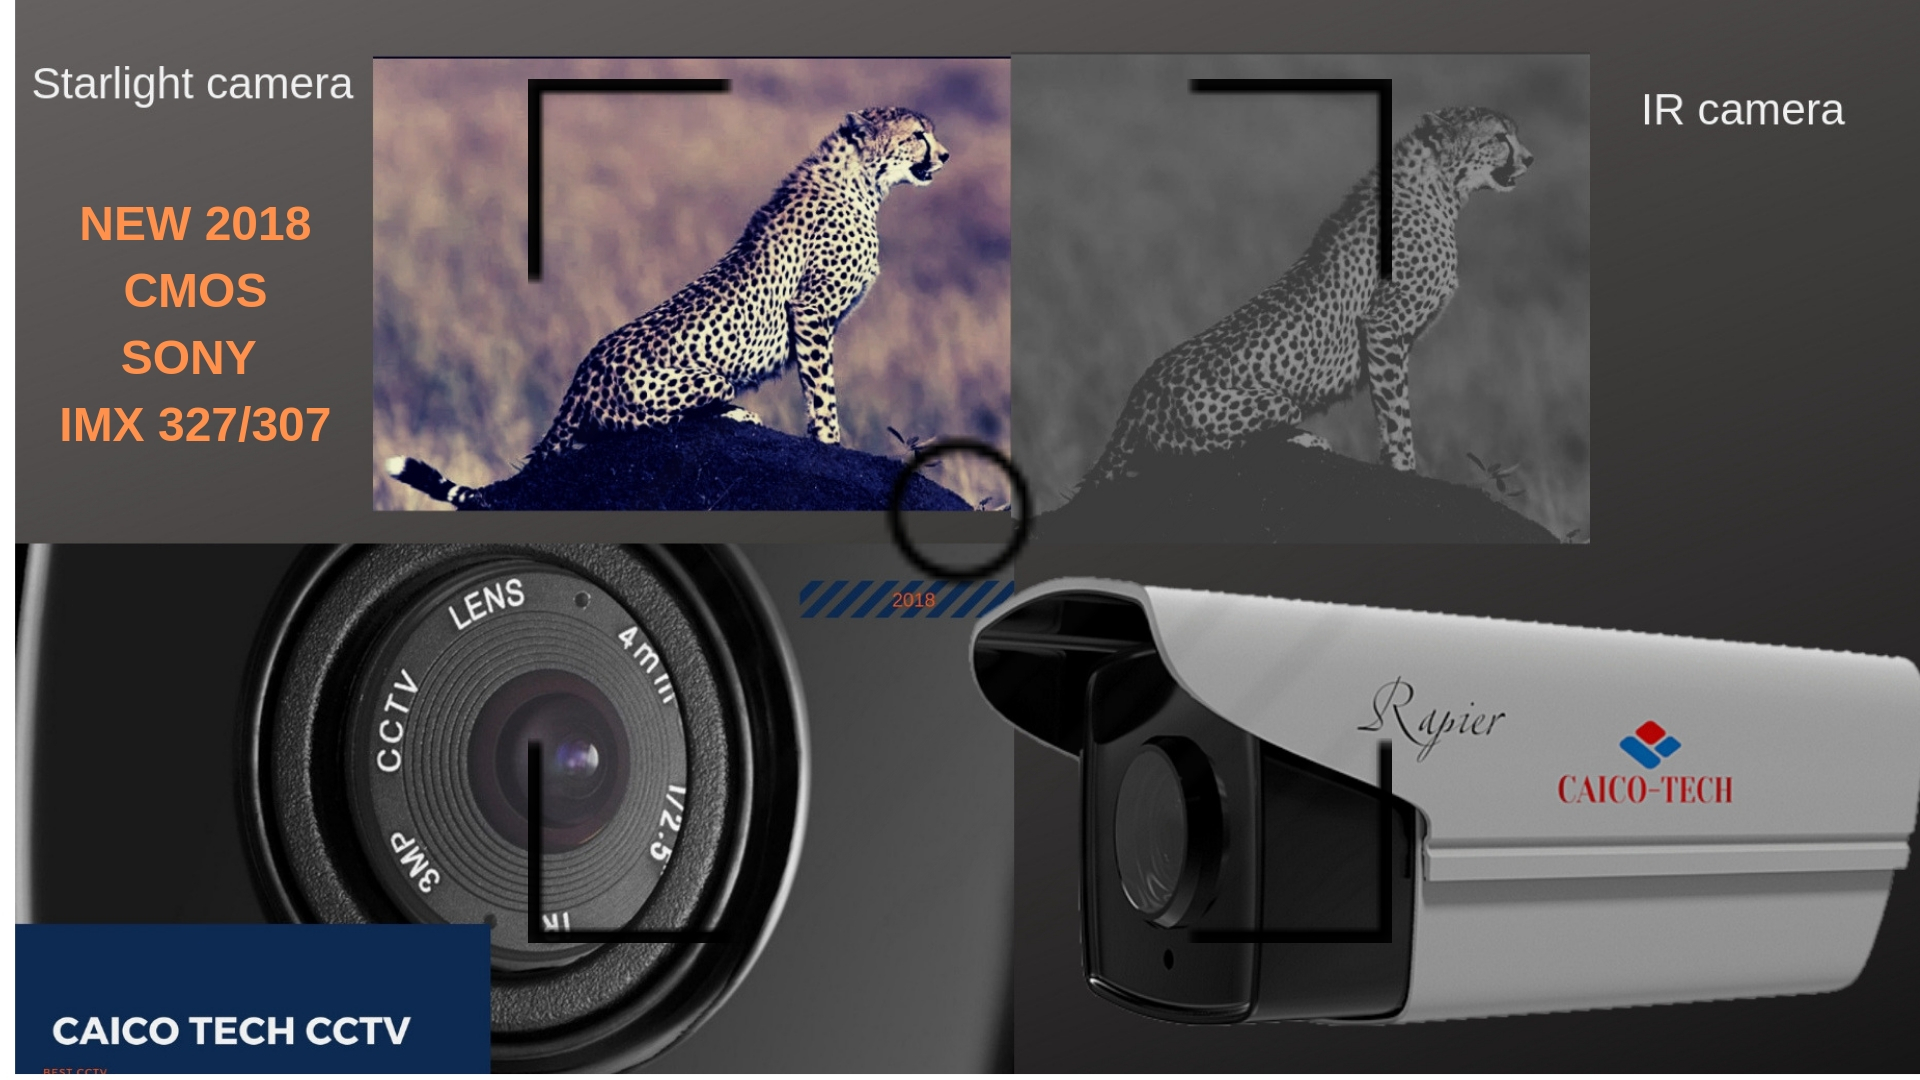 CAICO TECH CCTV STARLIHGT КАМЕРА CMOS SONY IMX 307/327